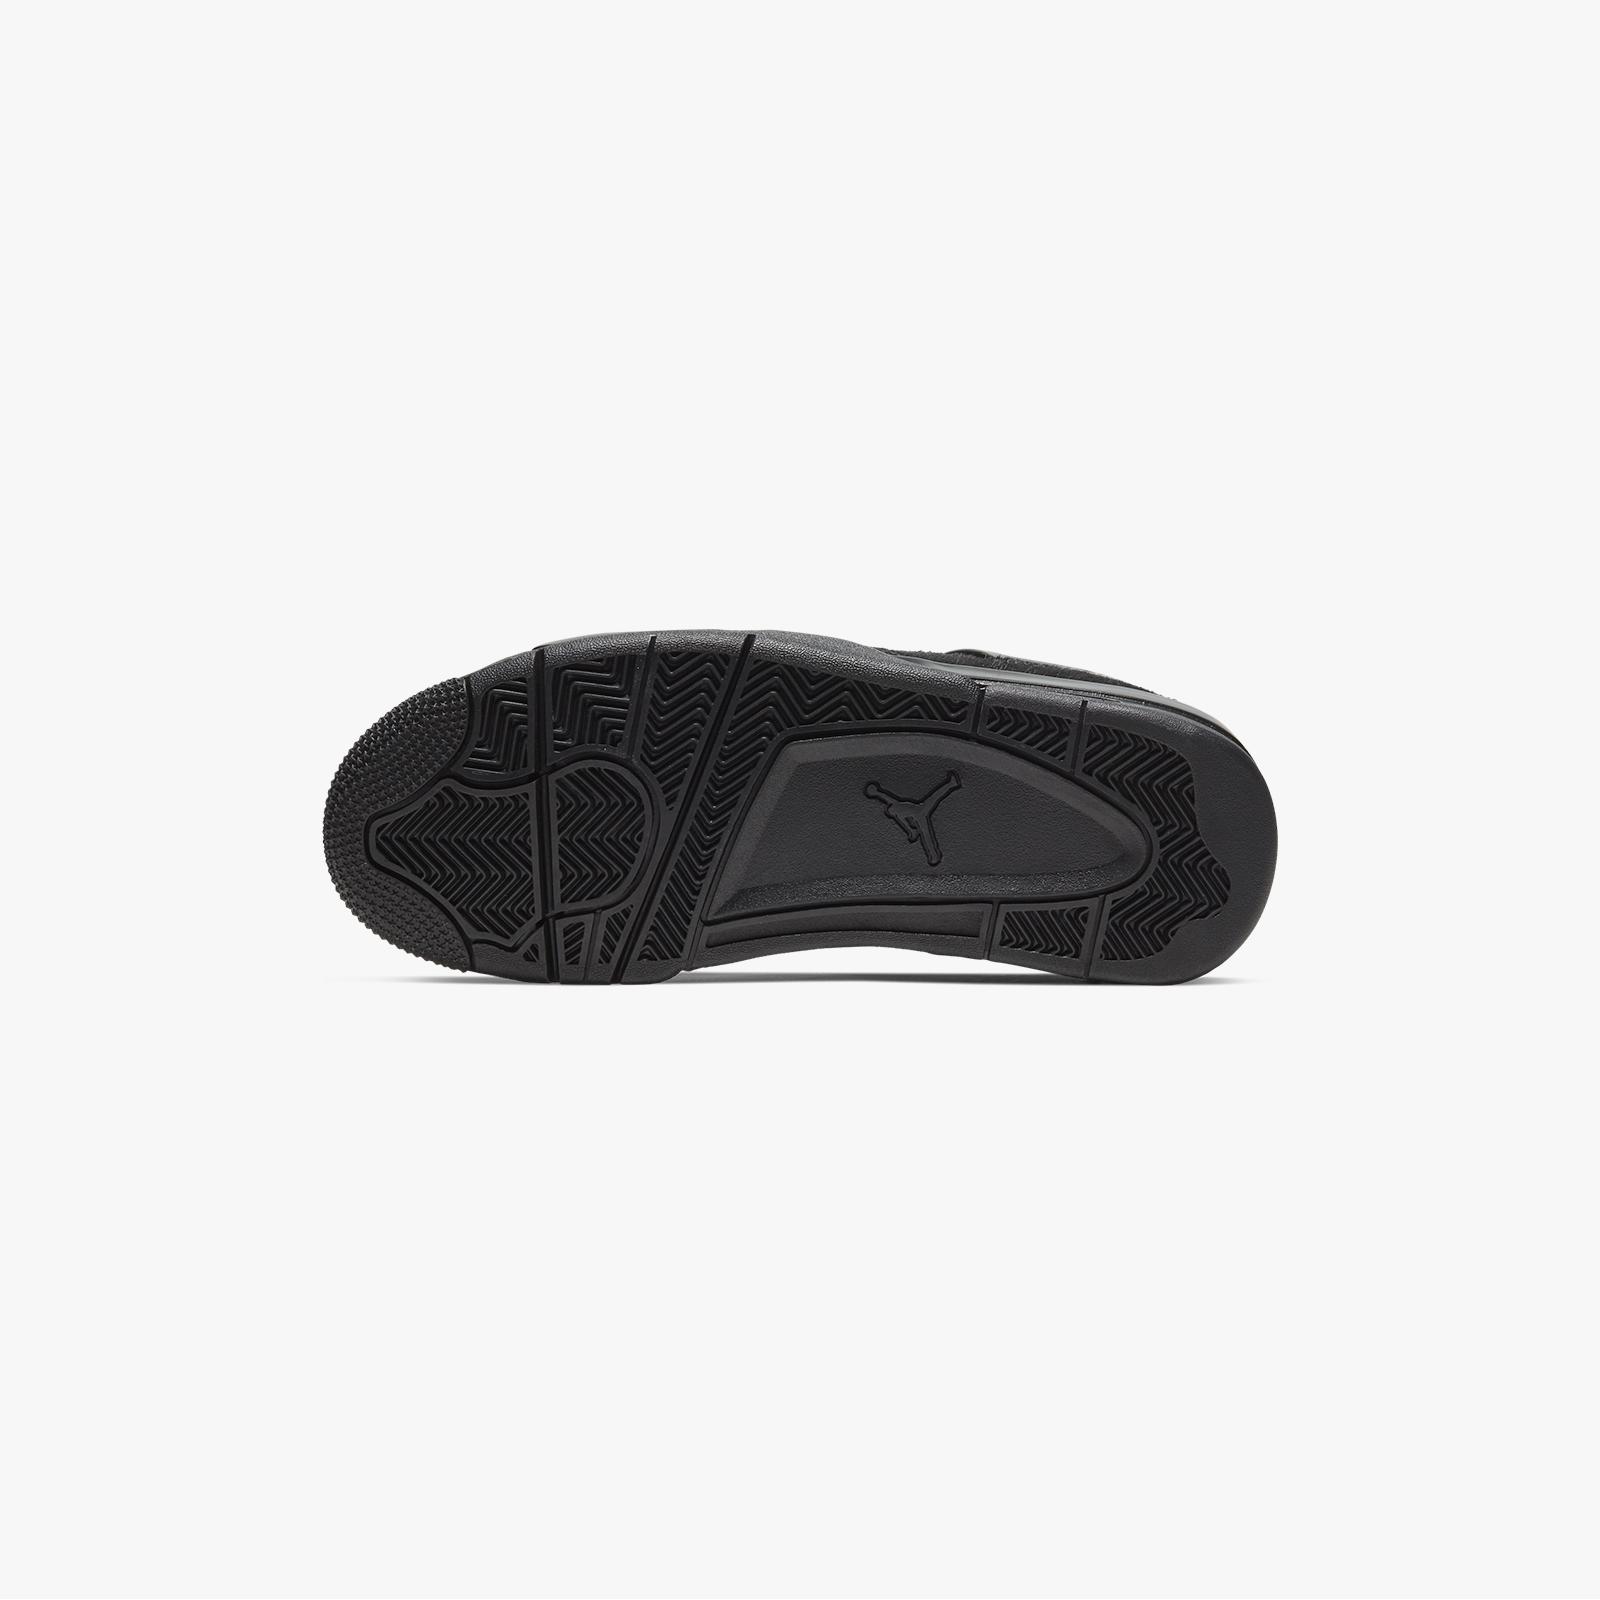 Editor Disfraces Permanente  Jordan Brand Wmns Air Jordan 4 Retro x Olivia Kim - Ck2925-001 -  Sneakersnstuff | sneakers & streetwear online since 1999